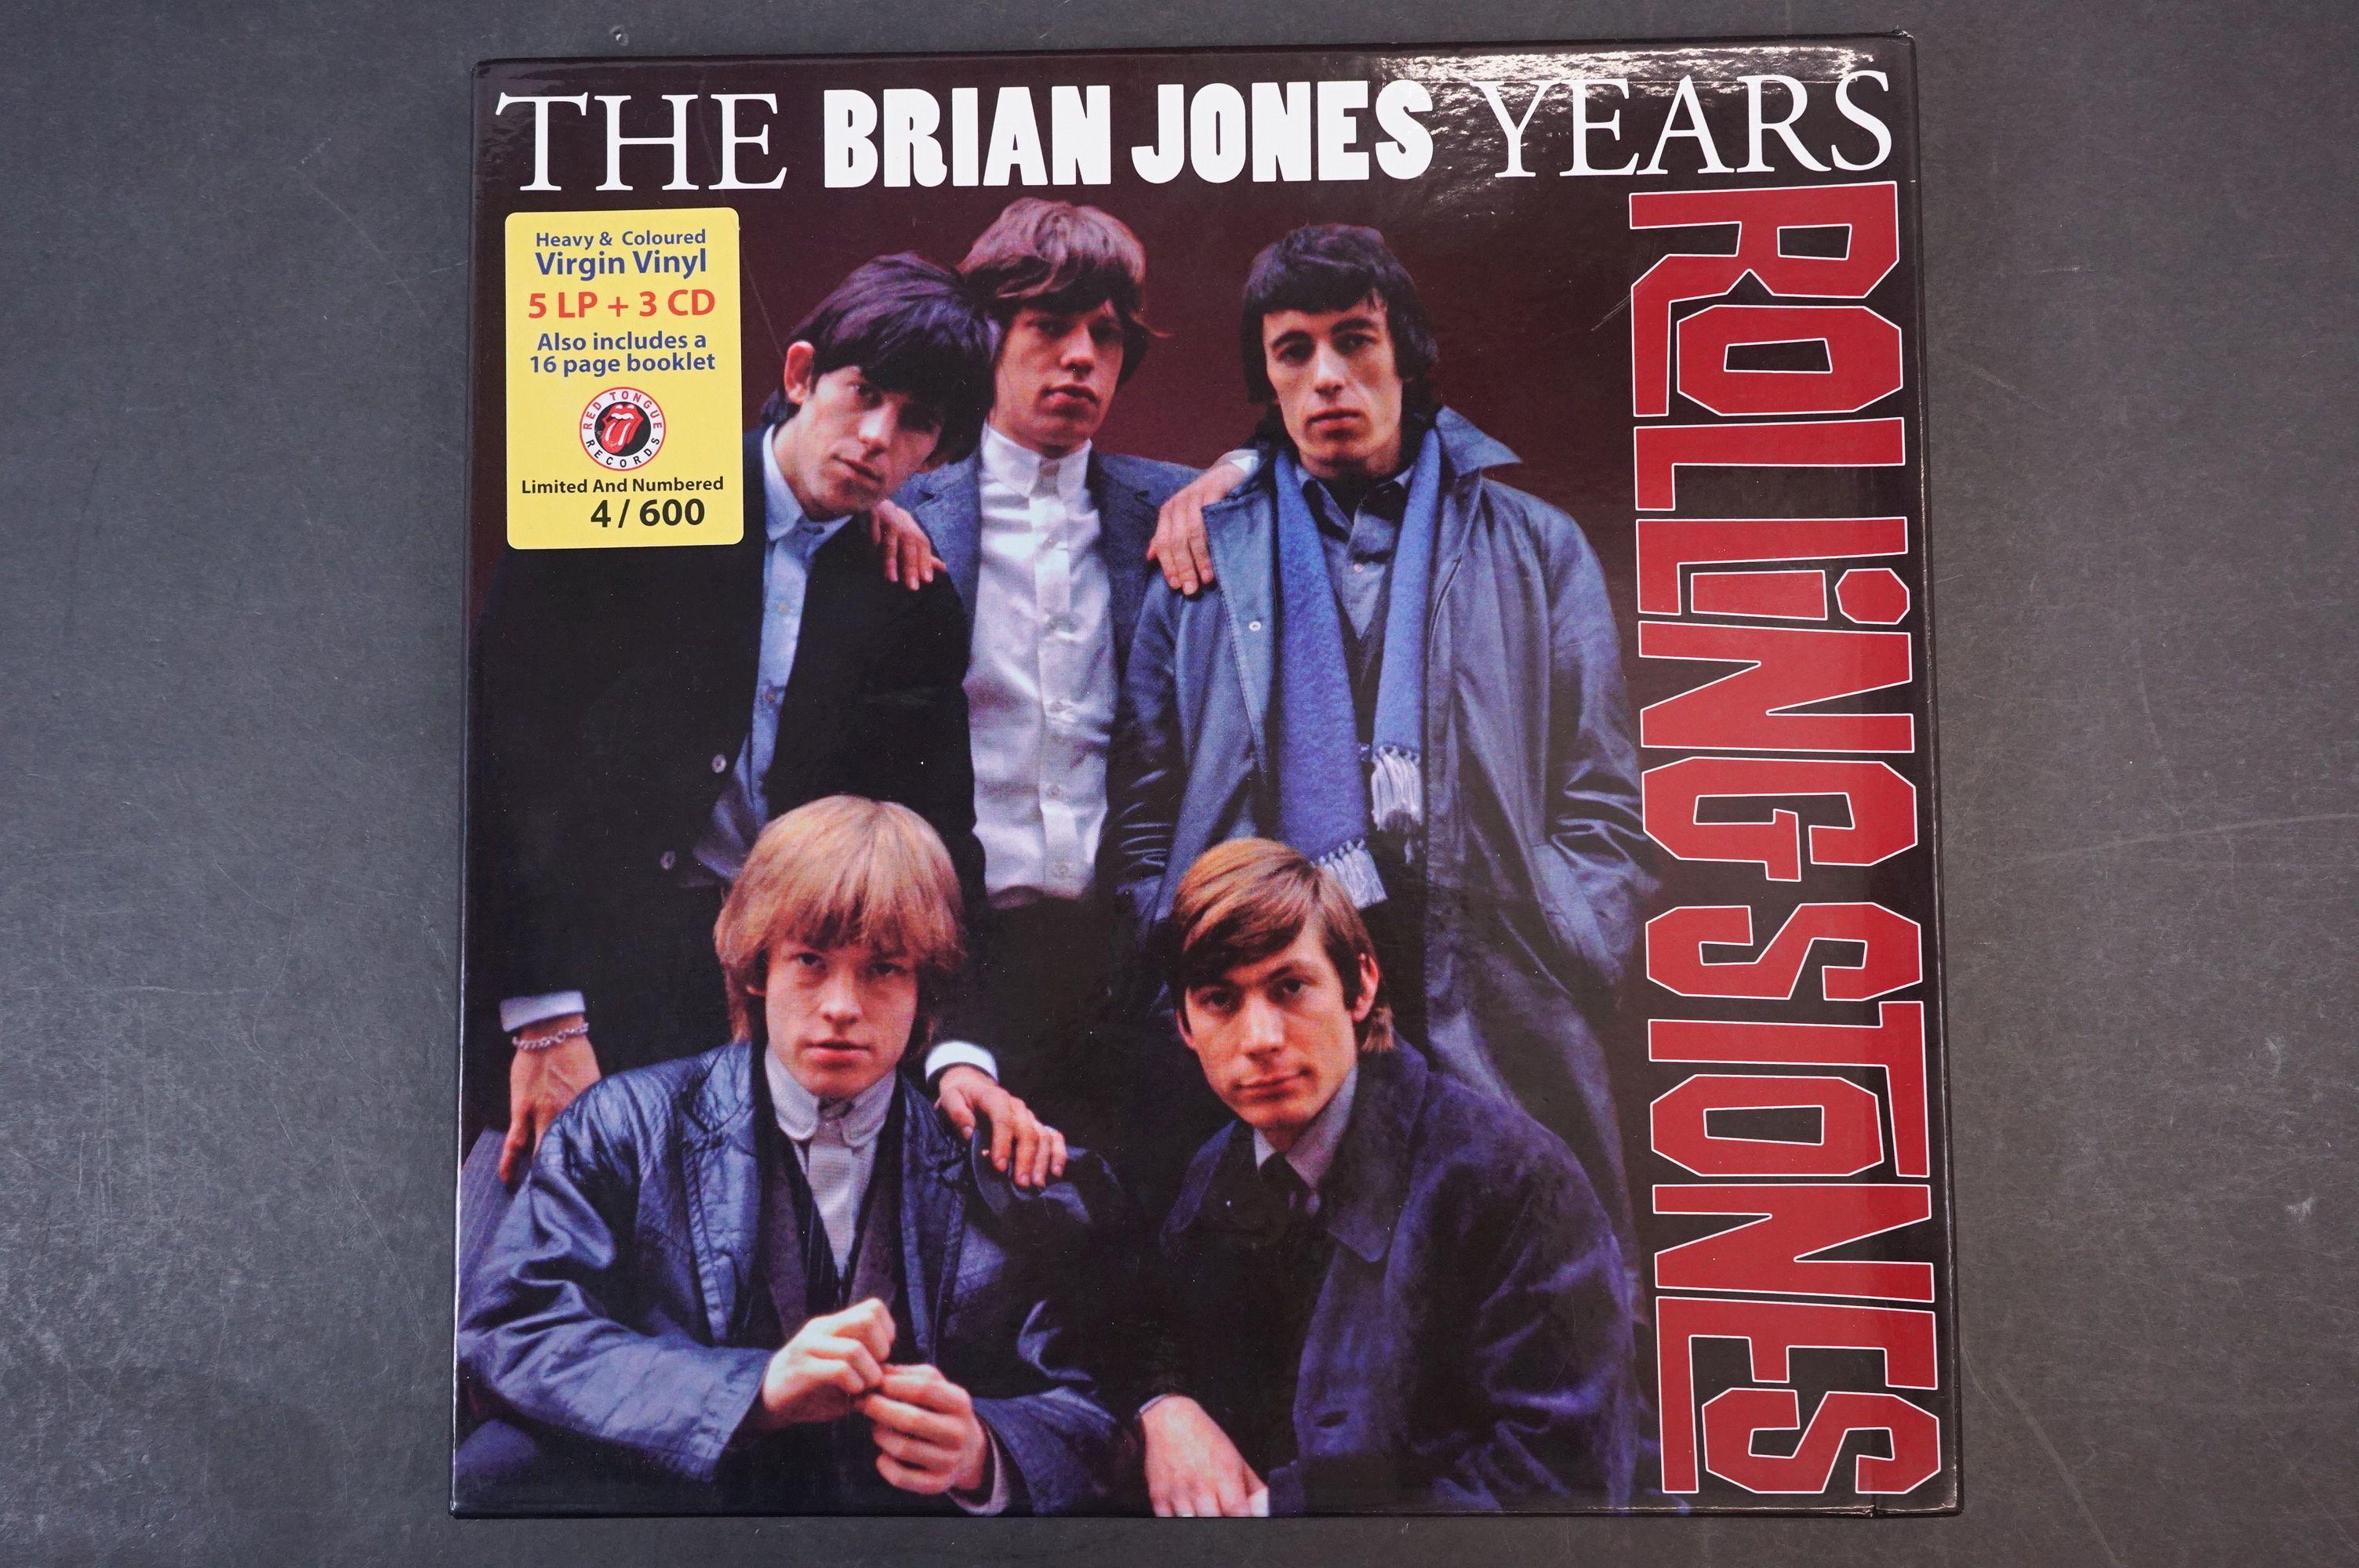 Vinyl - ltd edn The Rolling Stones The Brian Jones Years 5 LP / 3 CD Box Set RTR019, heavy